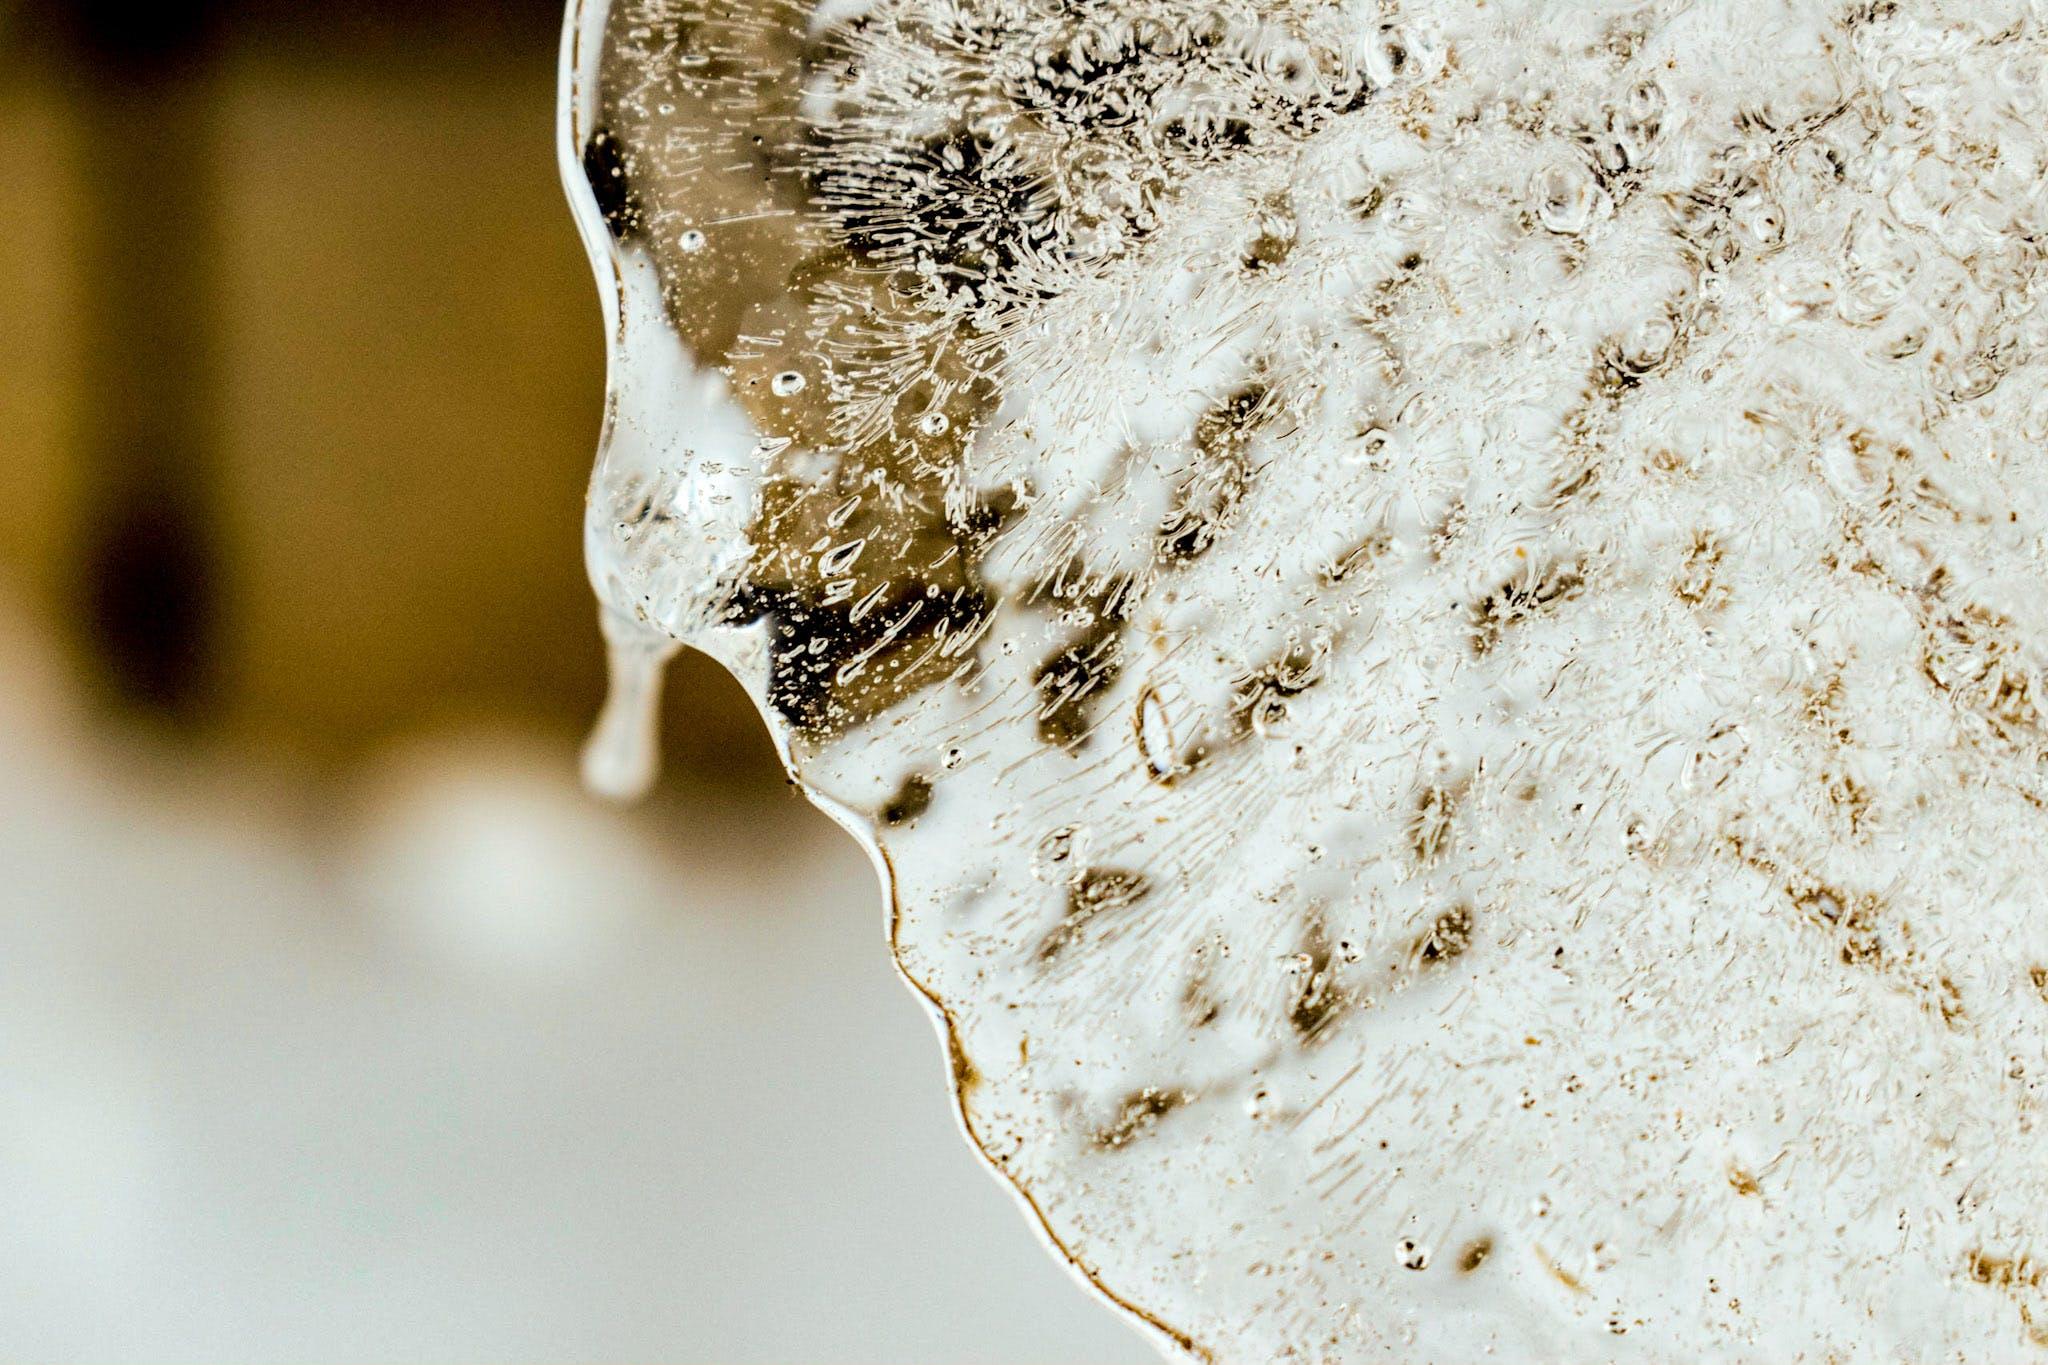 Closeup of an Icy Flake